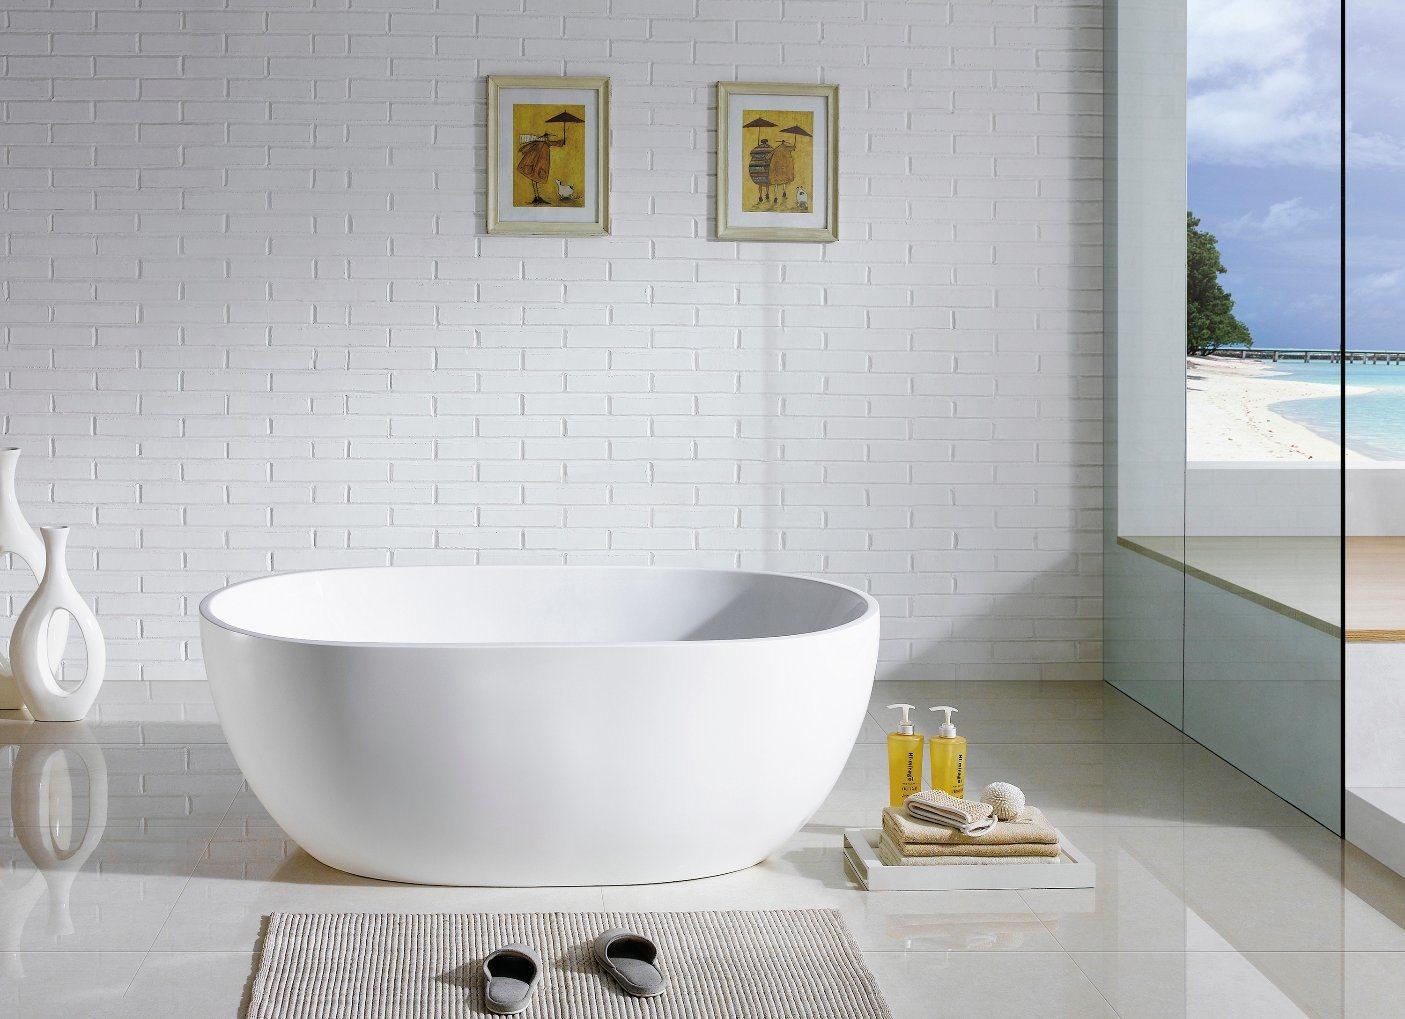 China Morden Bathrooms Hot Oval Freestanding Acrylic&Resin Bath Tub ...